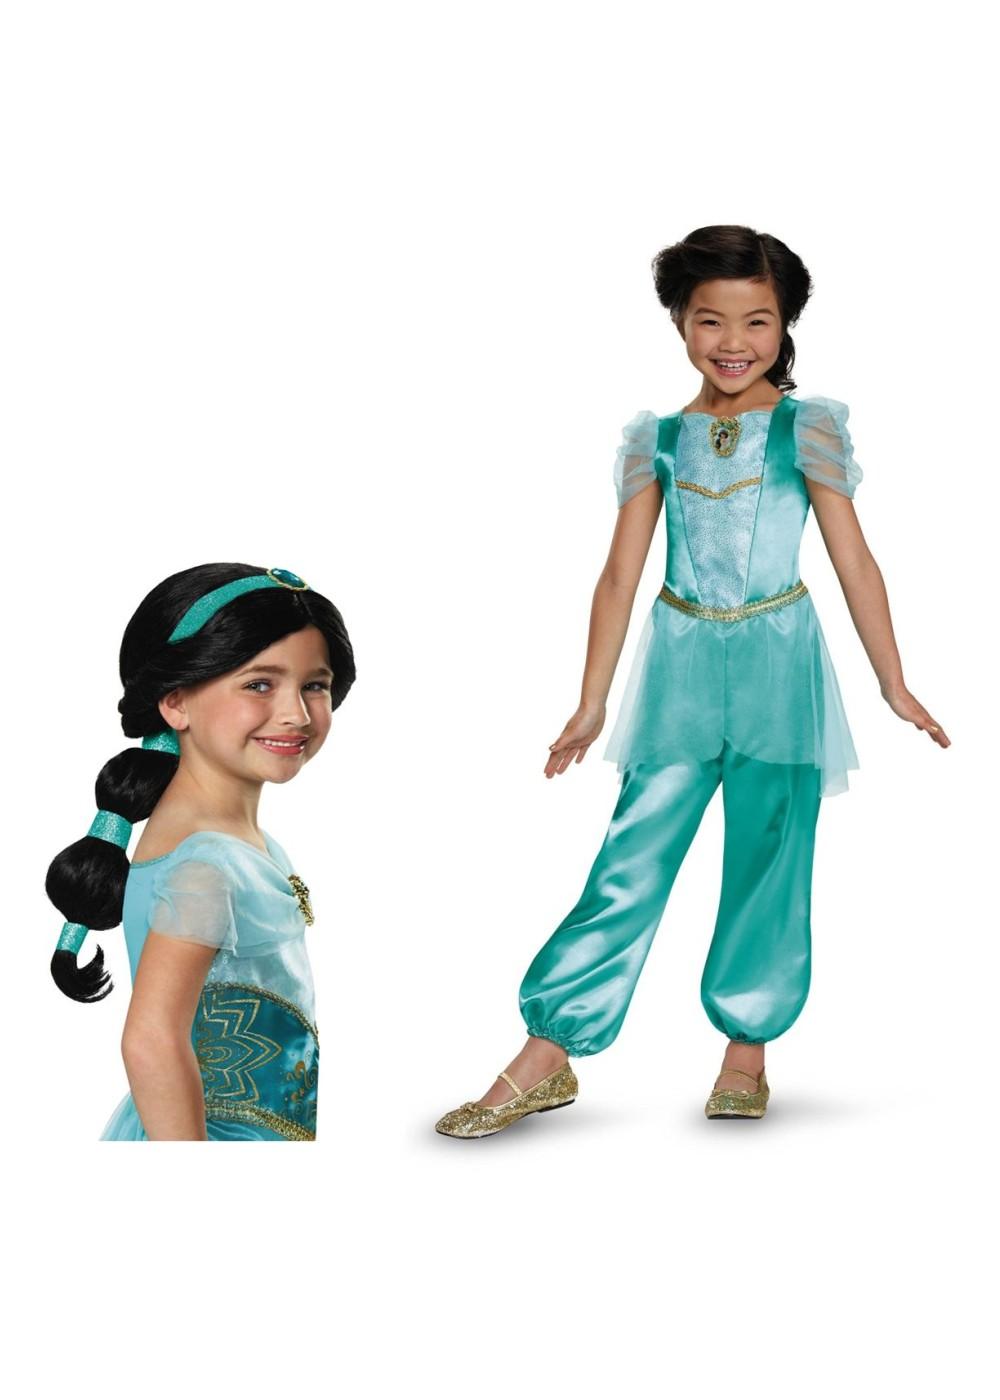 princess jasmine girls costume and wig set princess costumes. Black Bedroom Furniture Sets. Home Design Ideas